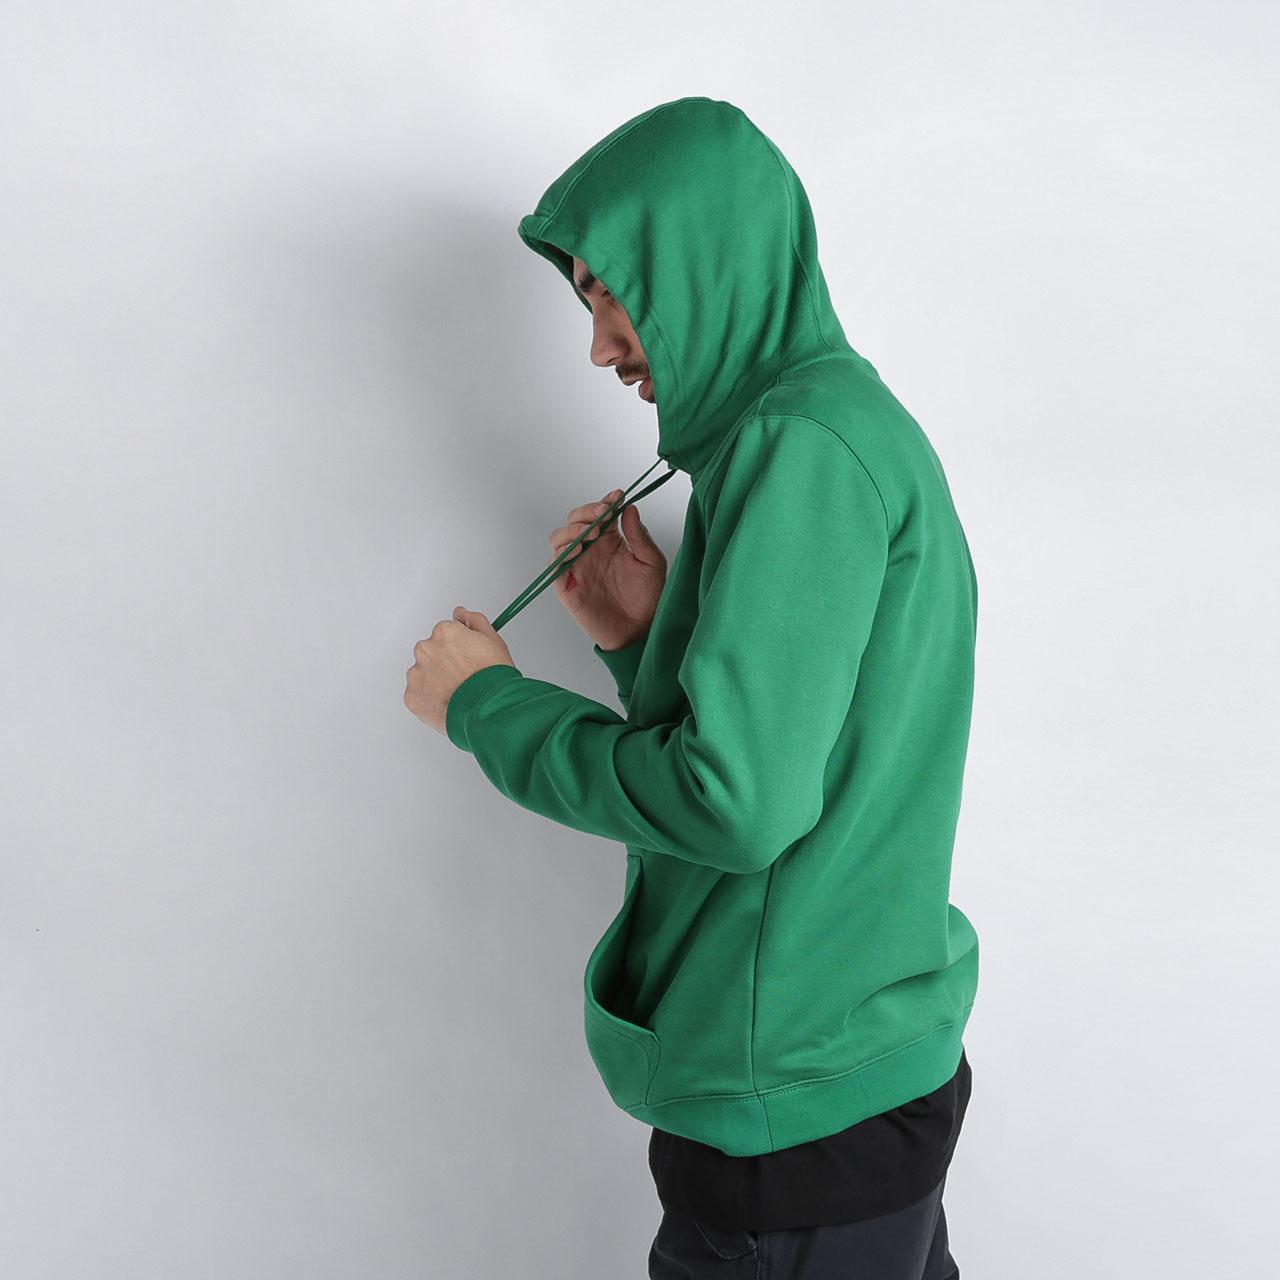 мужскую зелёную  толстовка nike celtics city logo CD3216-312 - цена, описание, фото 3